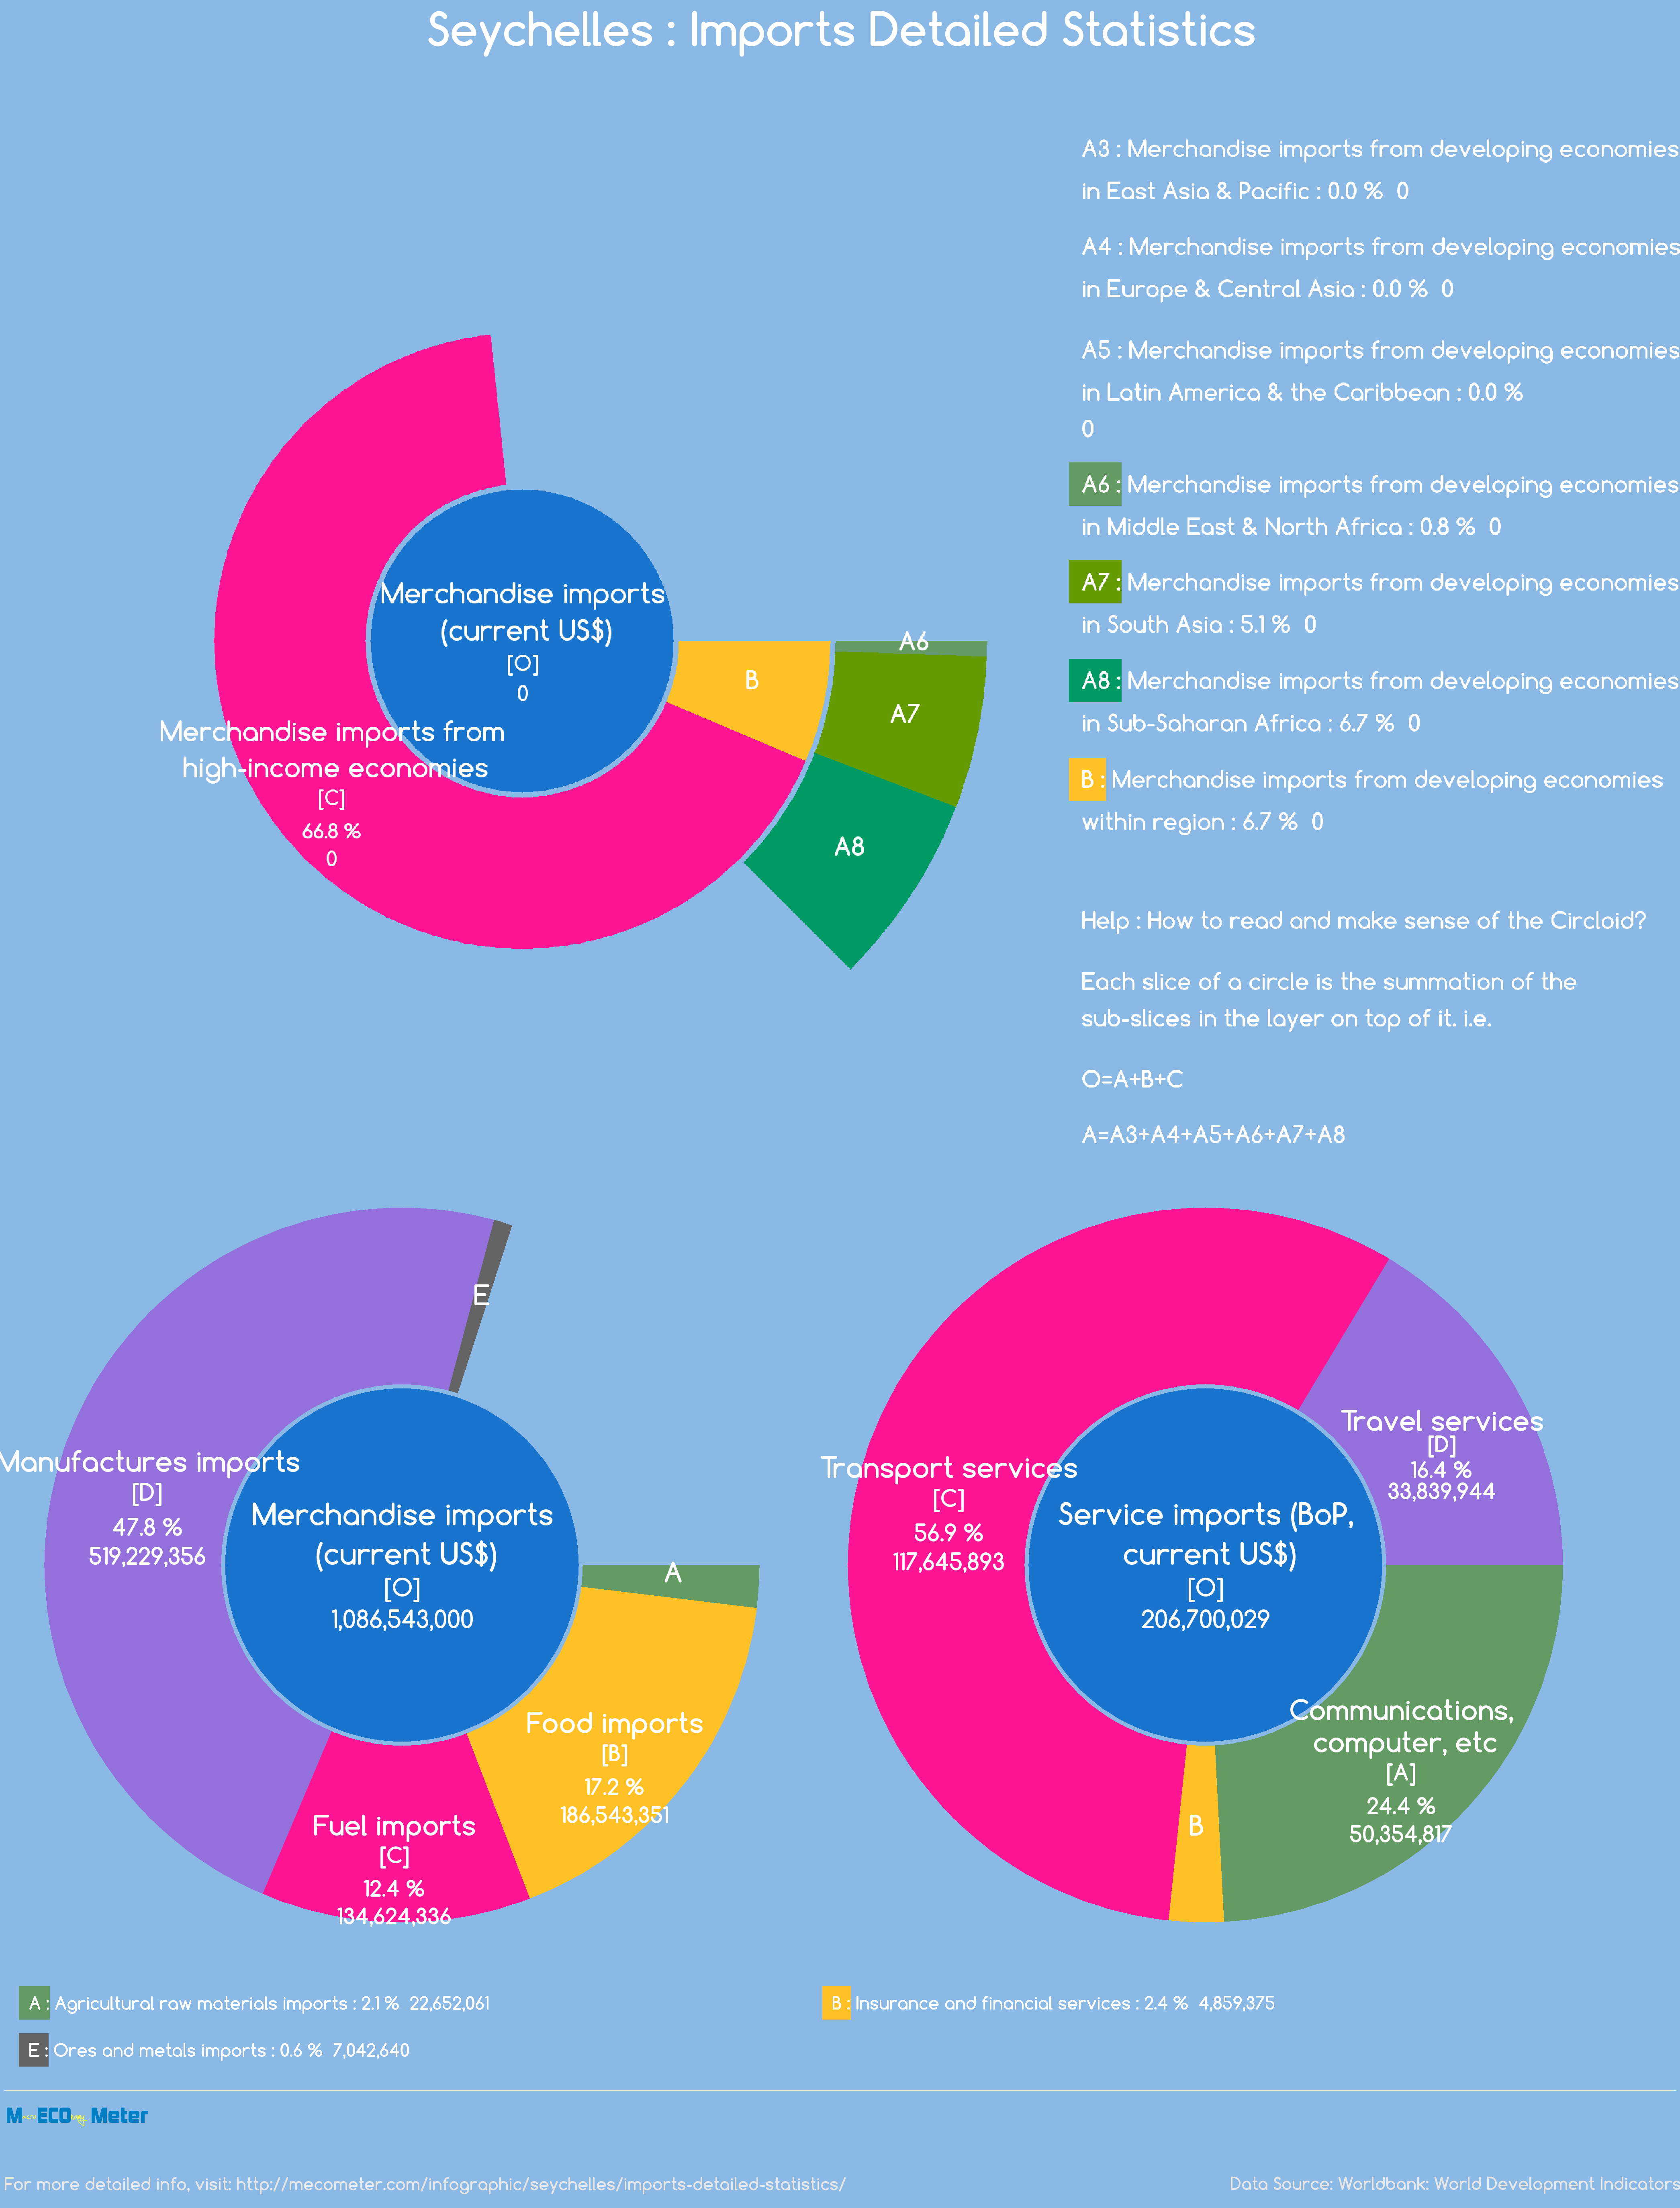 Seychelles : Imports Detailed Statistics